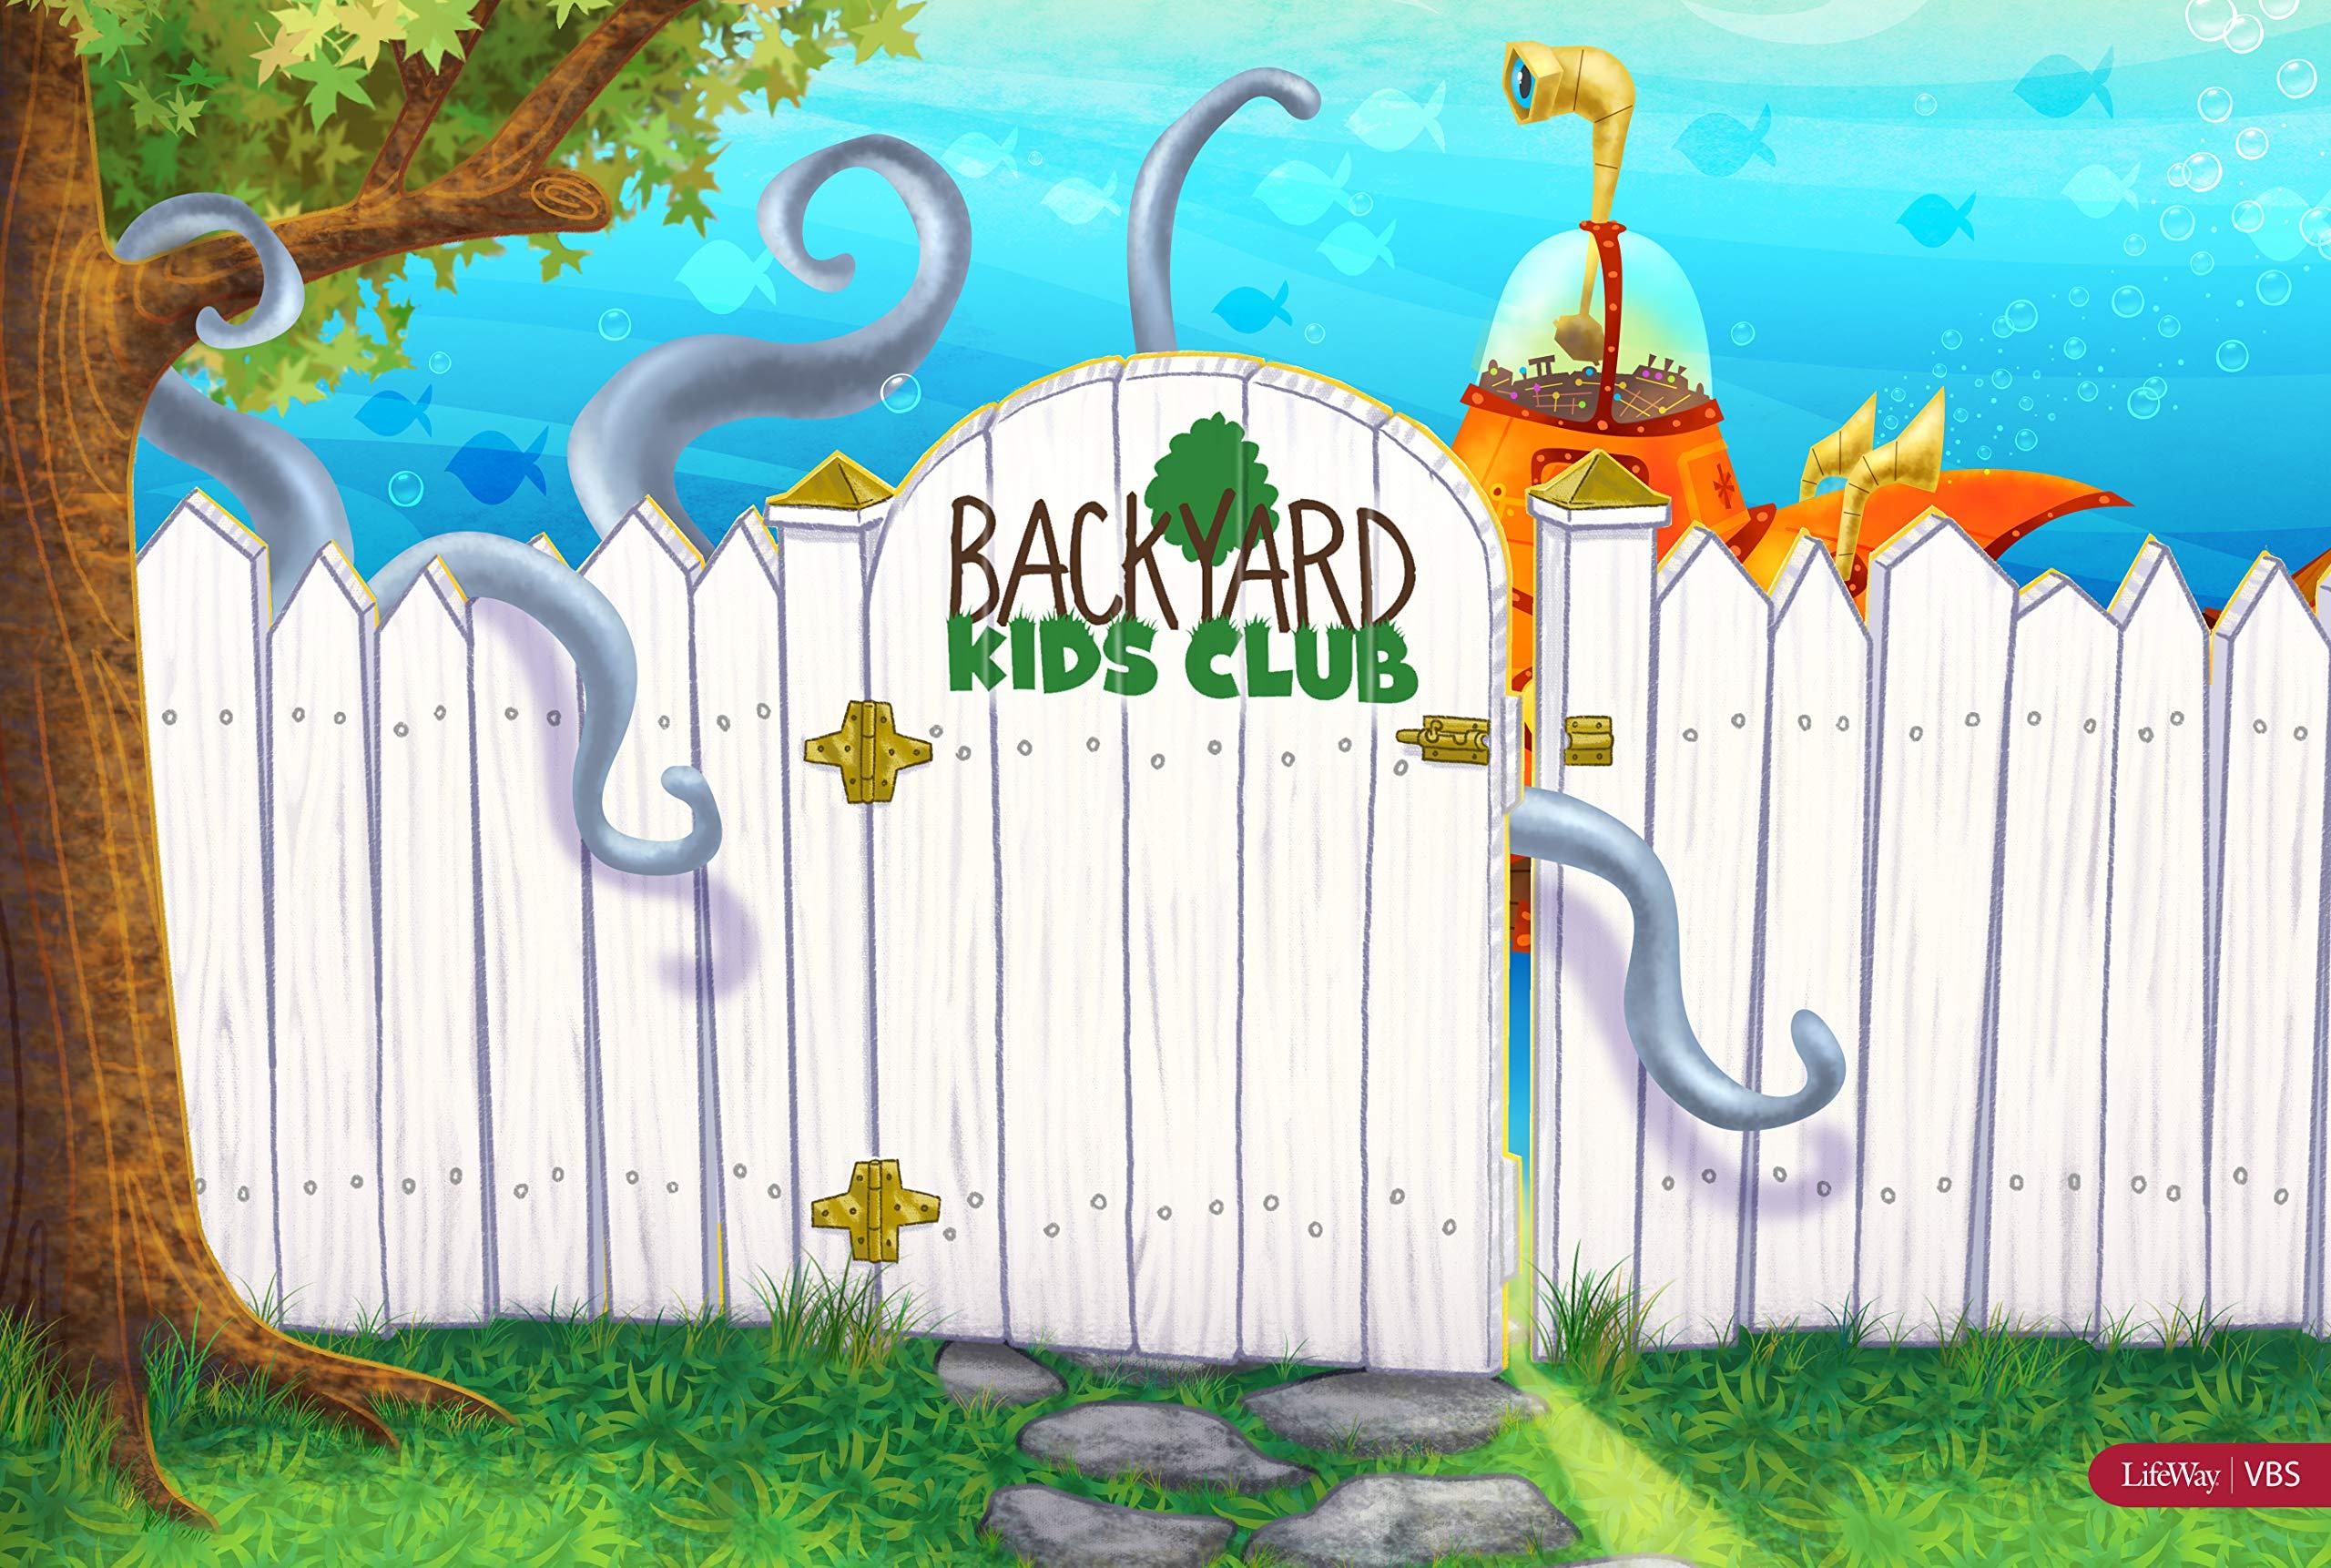 VBS 17 Submerged Backyard Kids Club Kit: LifeWay Kids